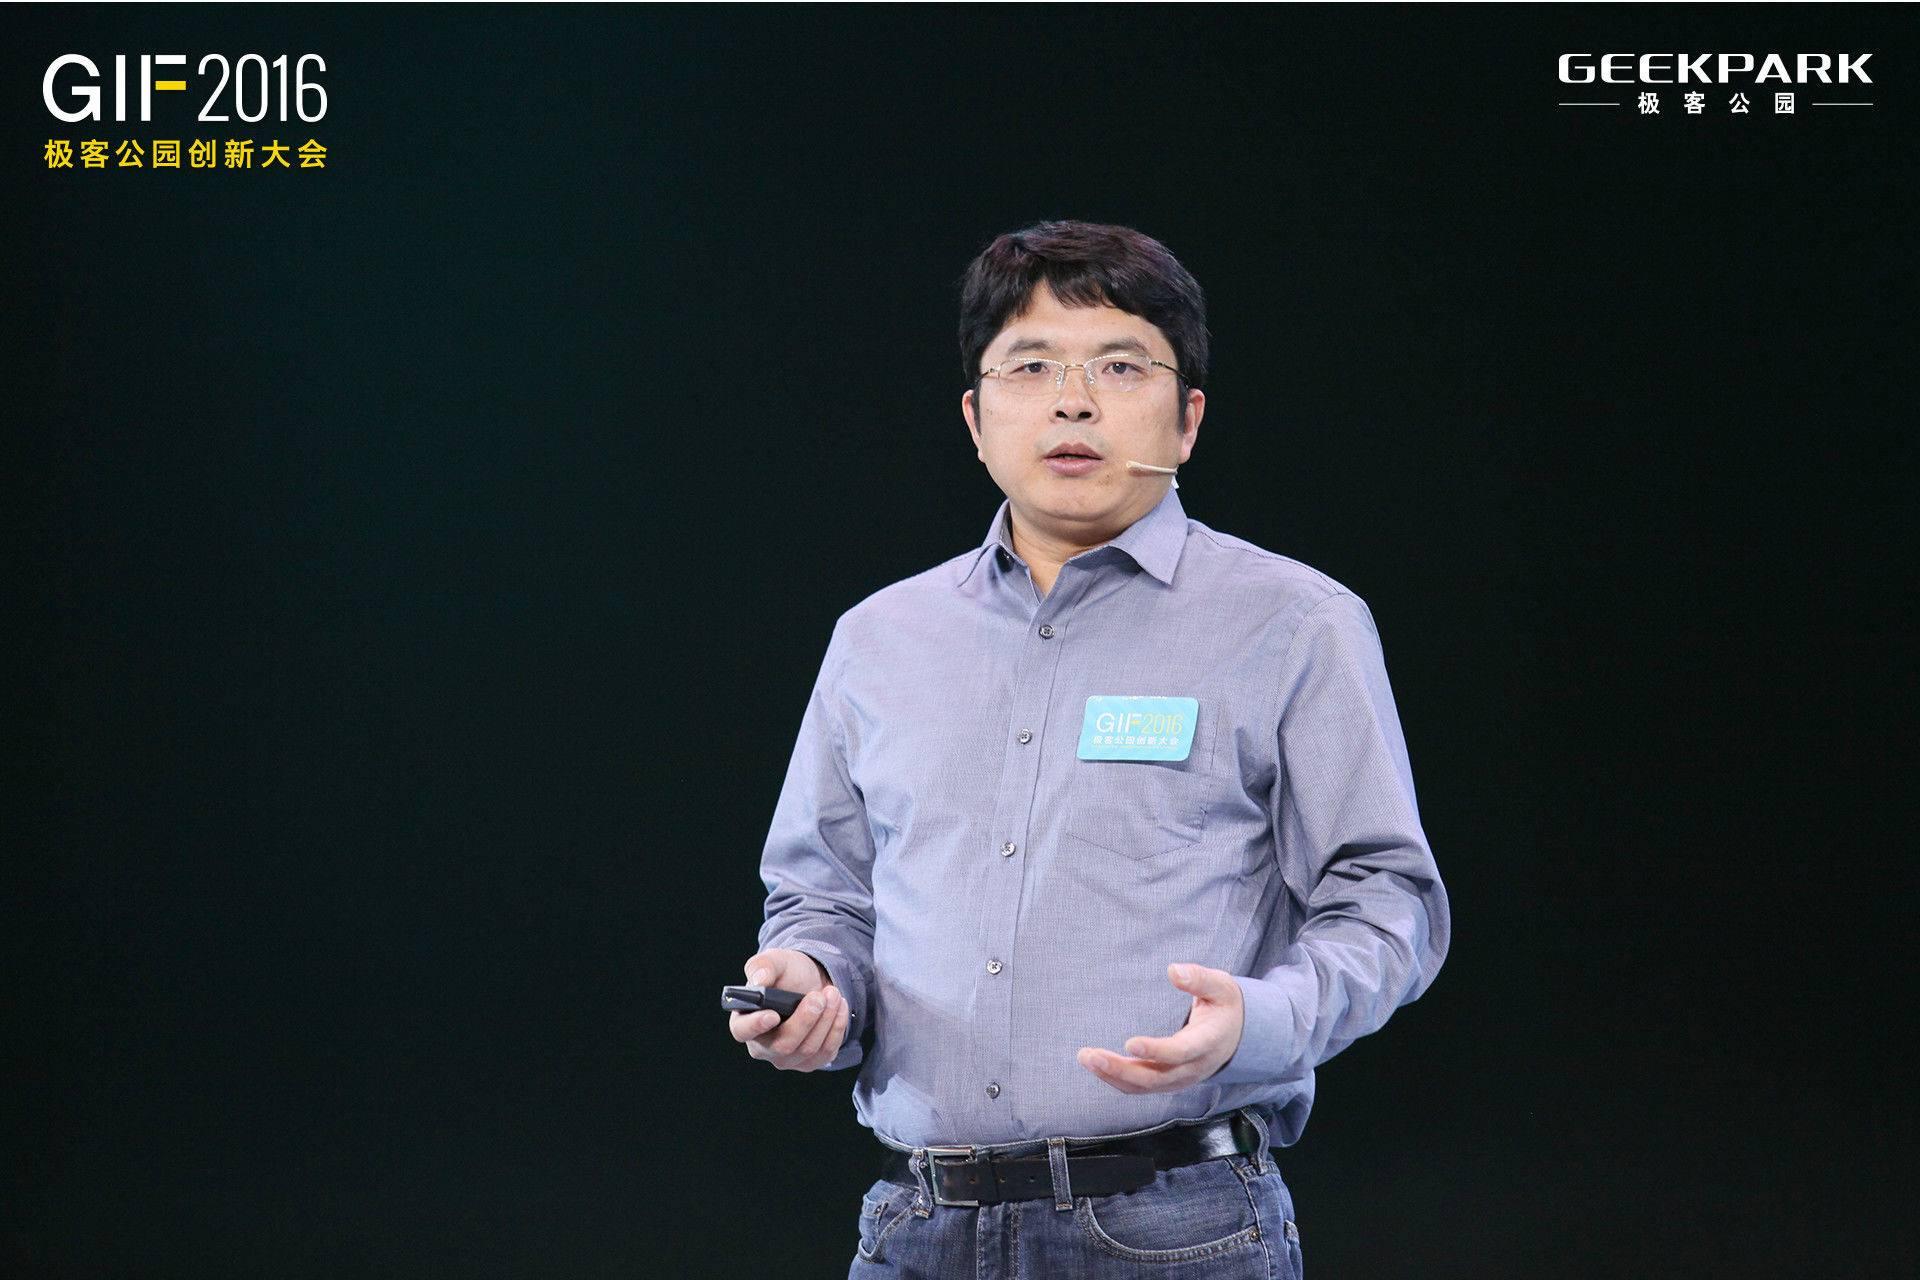 GIF2016011Trustlook创始人及CEO张亮mark.jpg